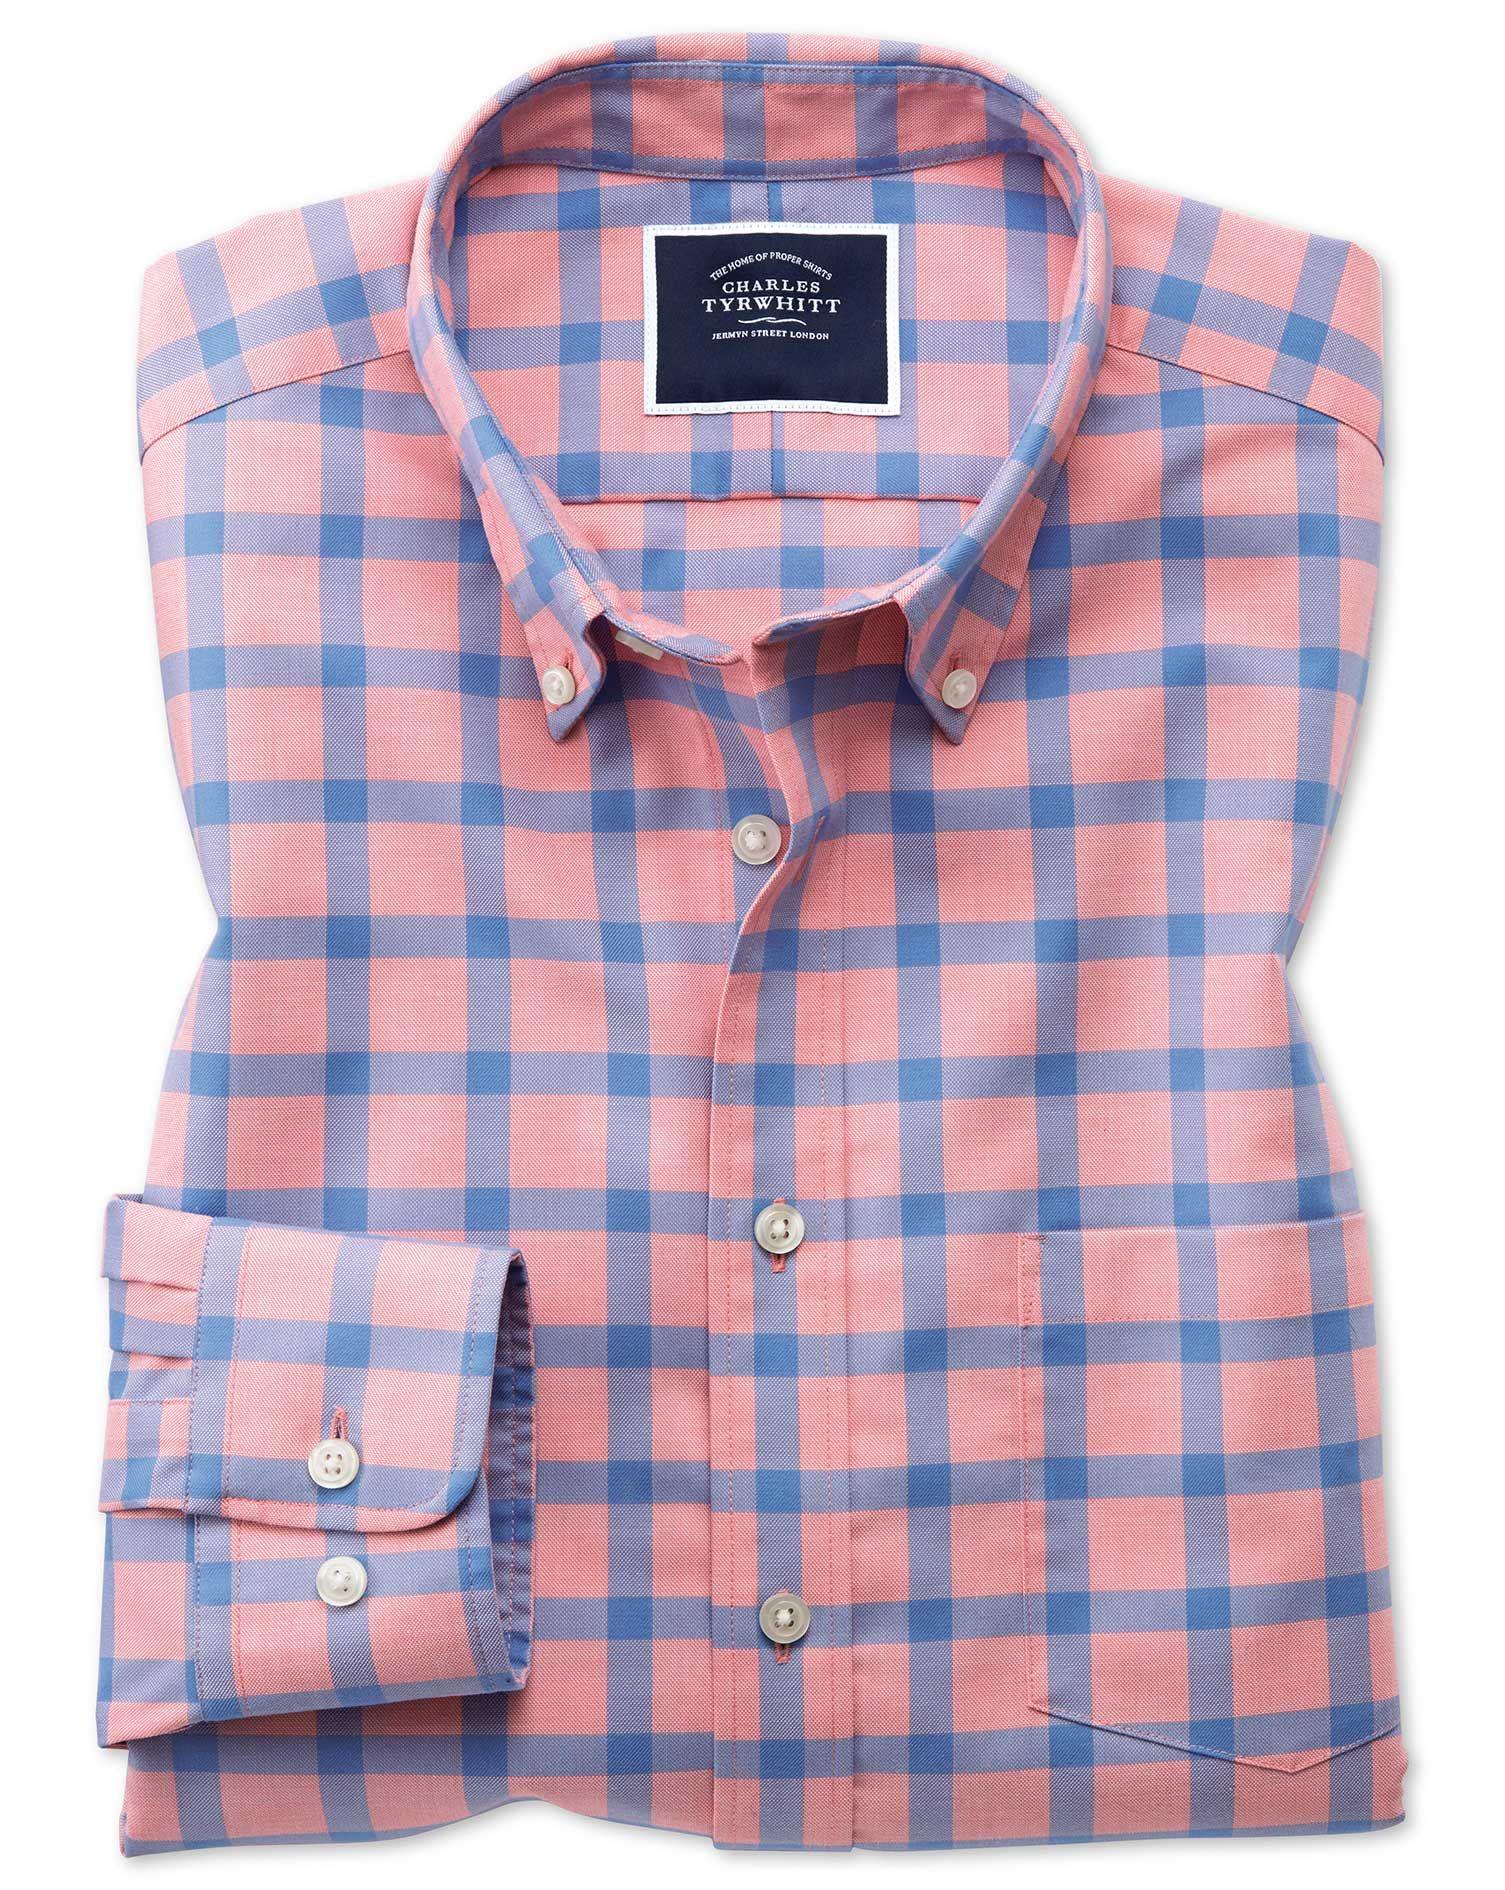 Men's Casual Shirts | Charles Tyrwhitt